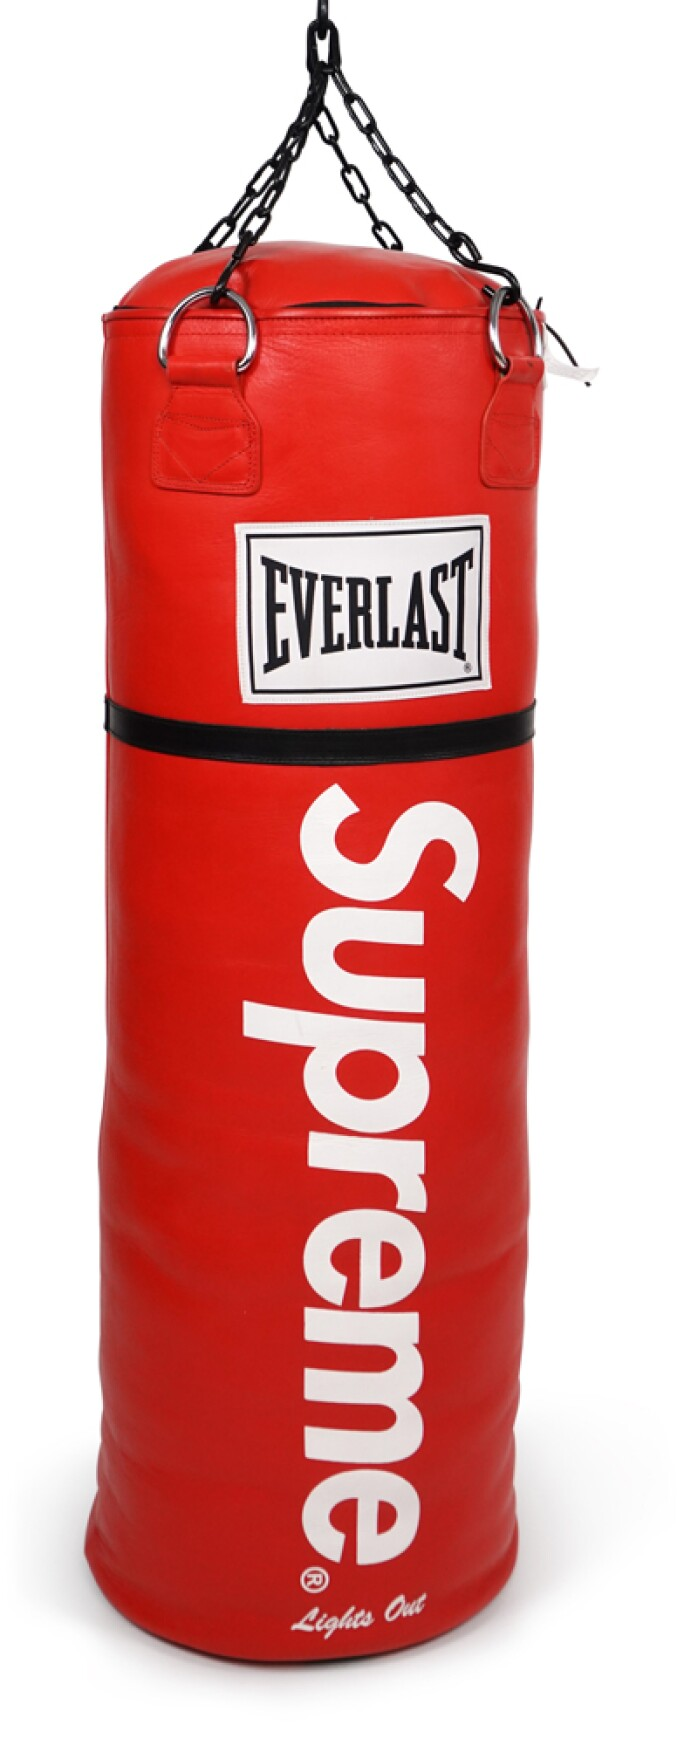 Supreme-x-Everlast-Punching-Bag.jpg